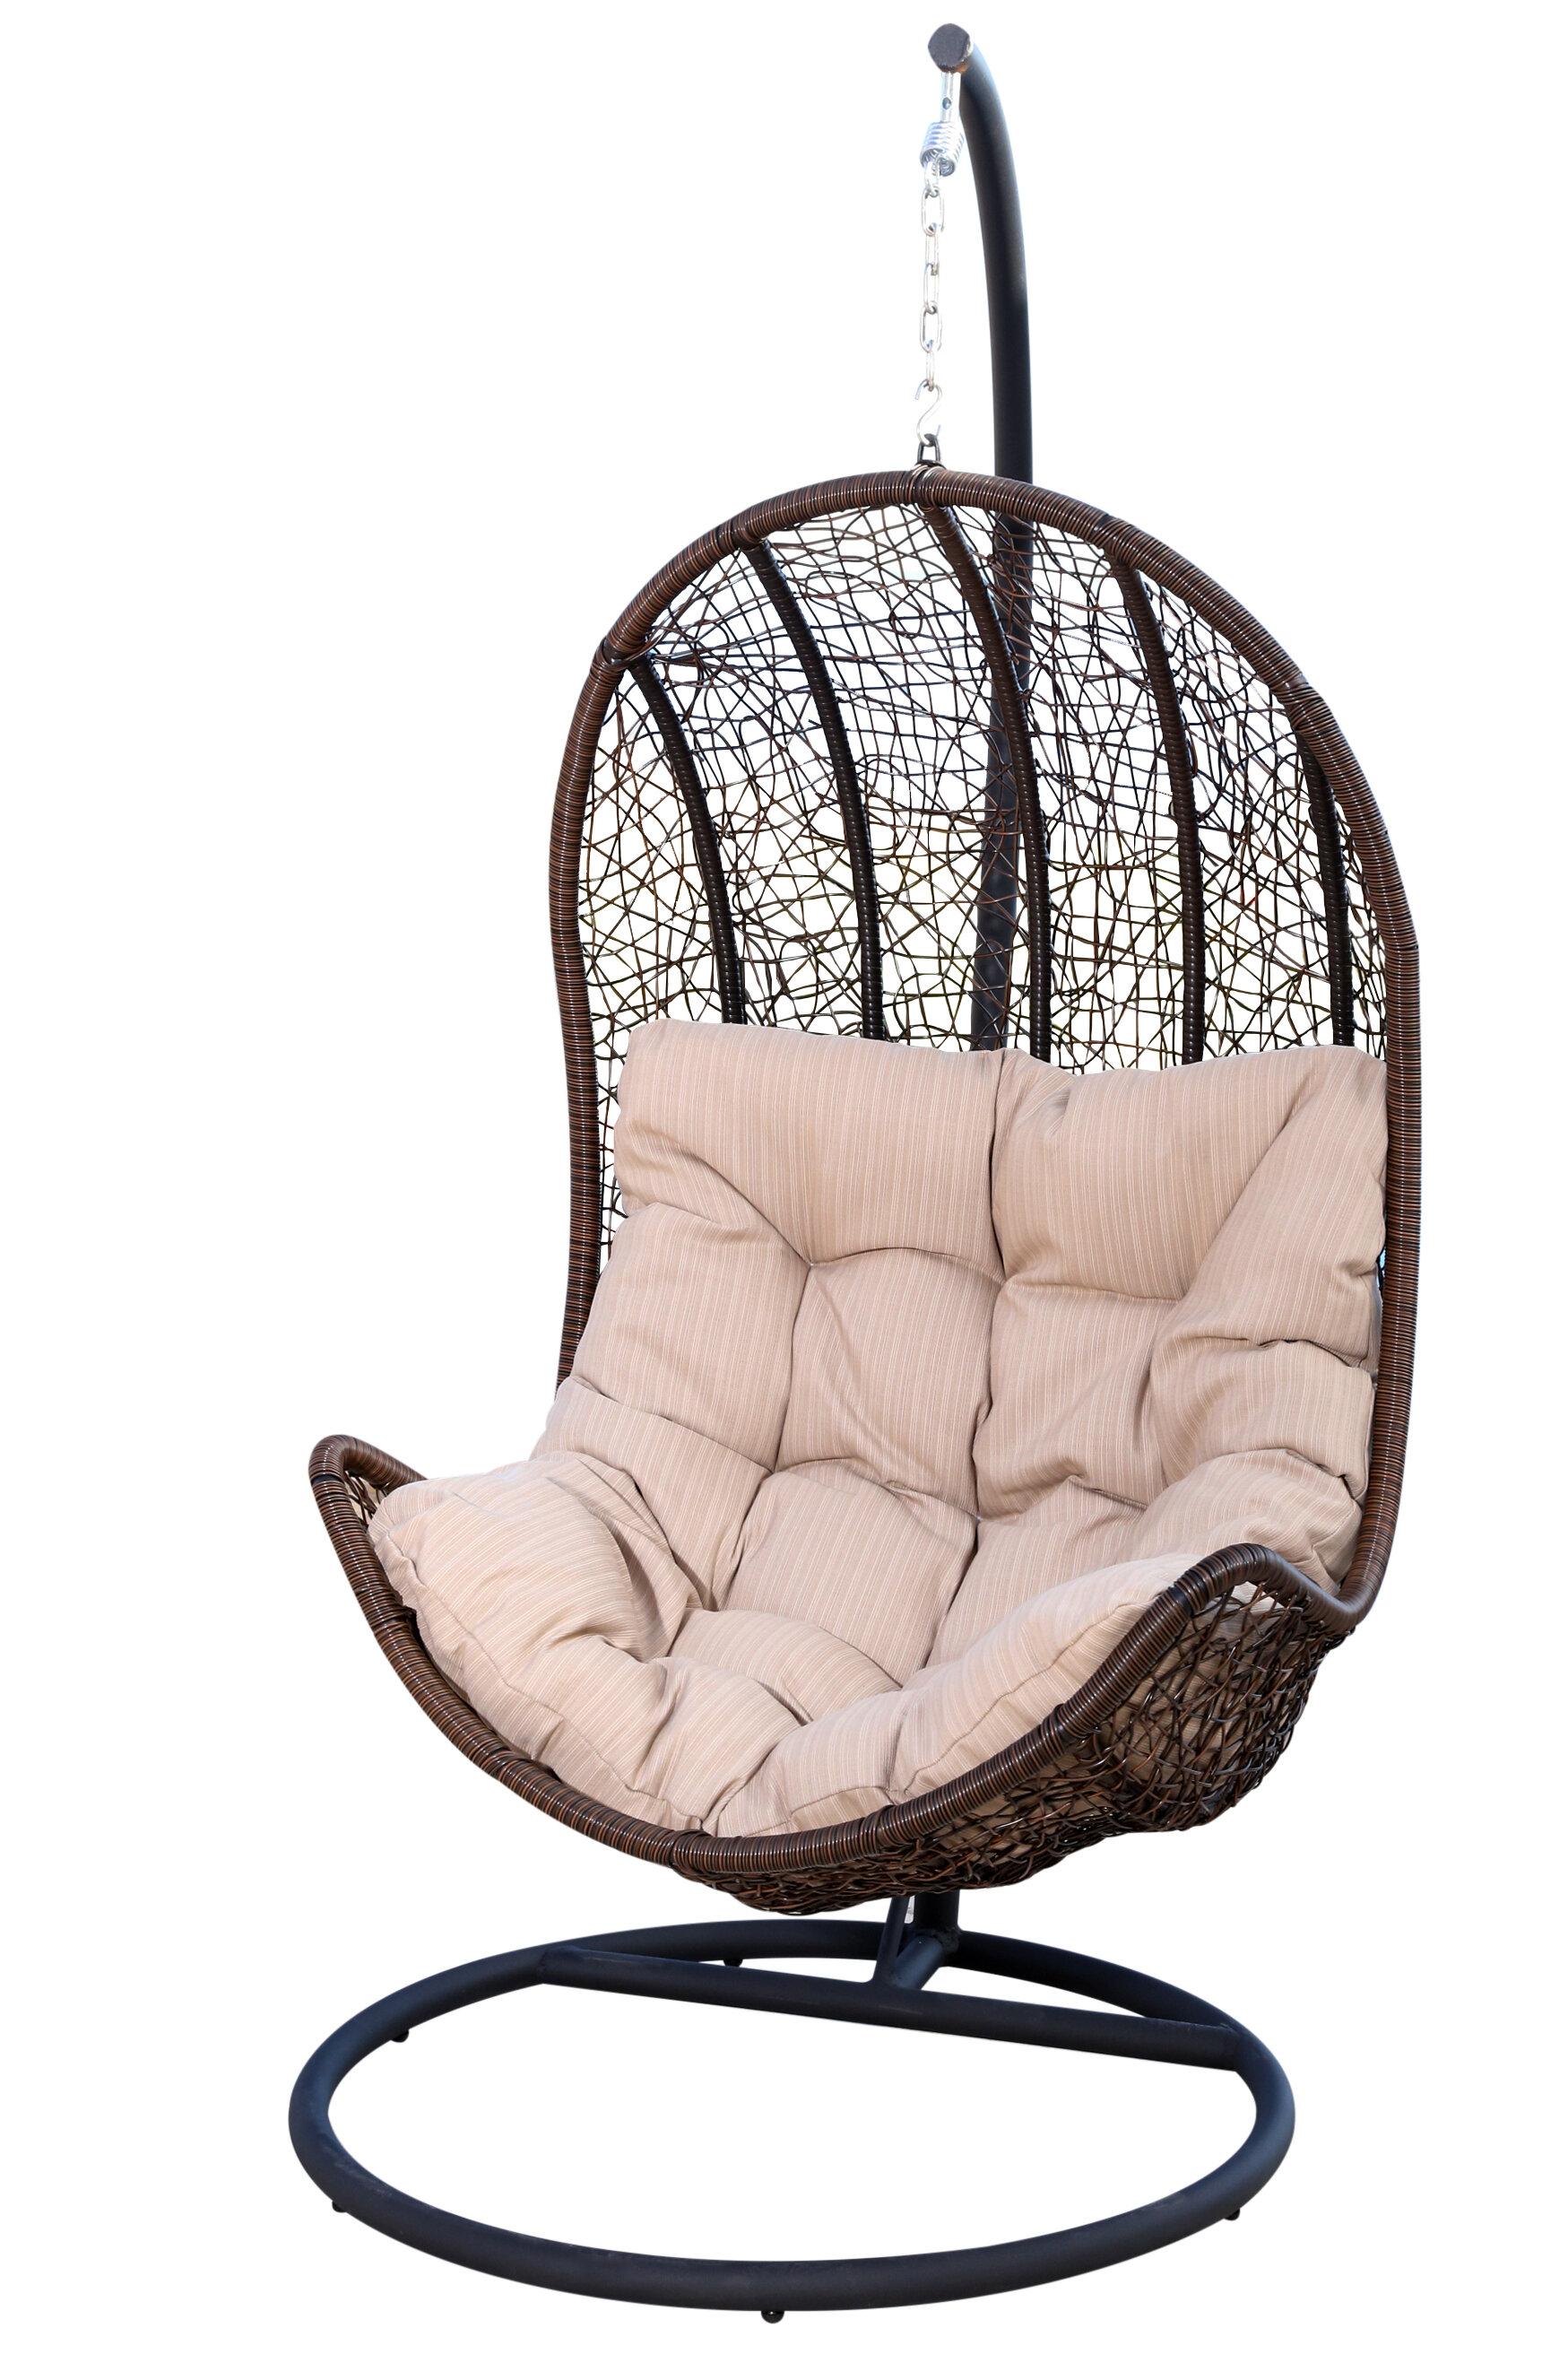 World Menagerie Ghazali Eggshaped Swing Chair With Stand U0026 Reviews | Wayfair